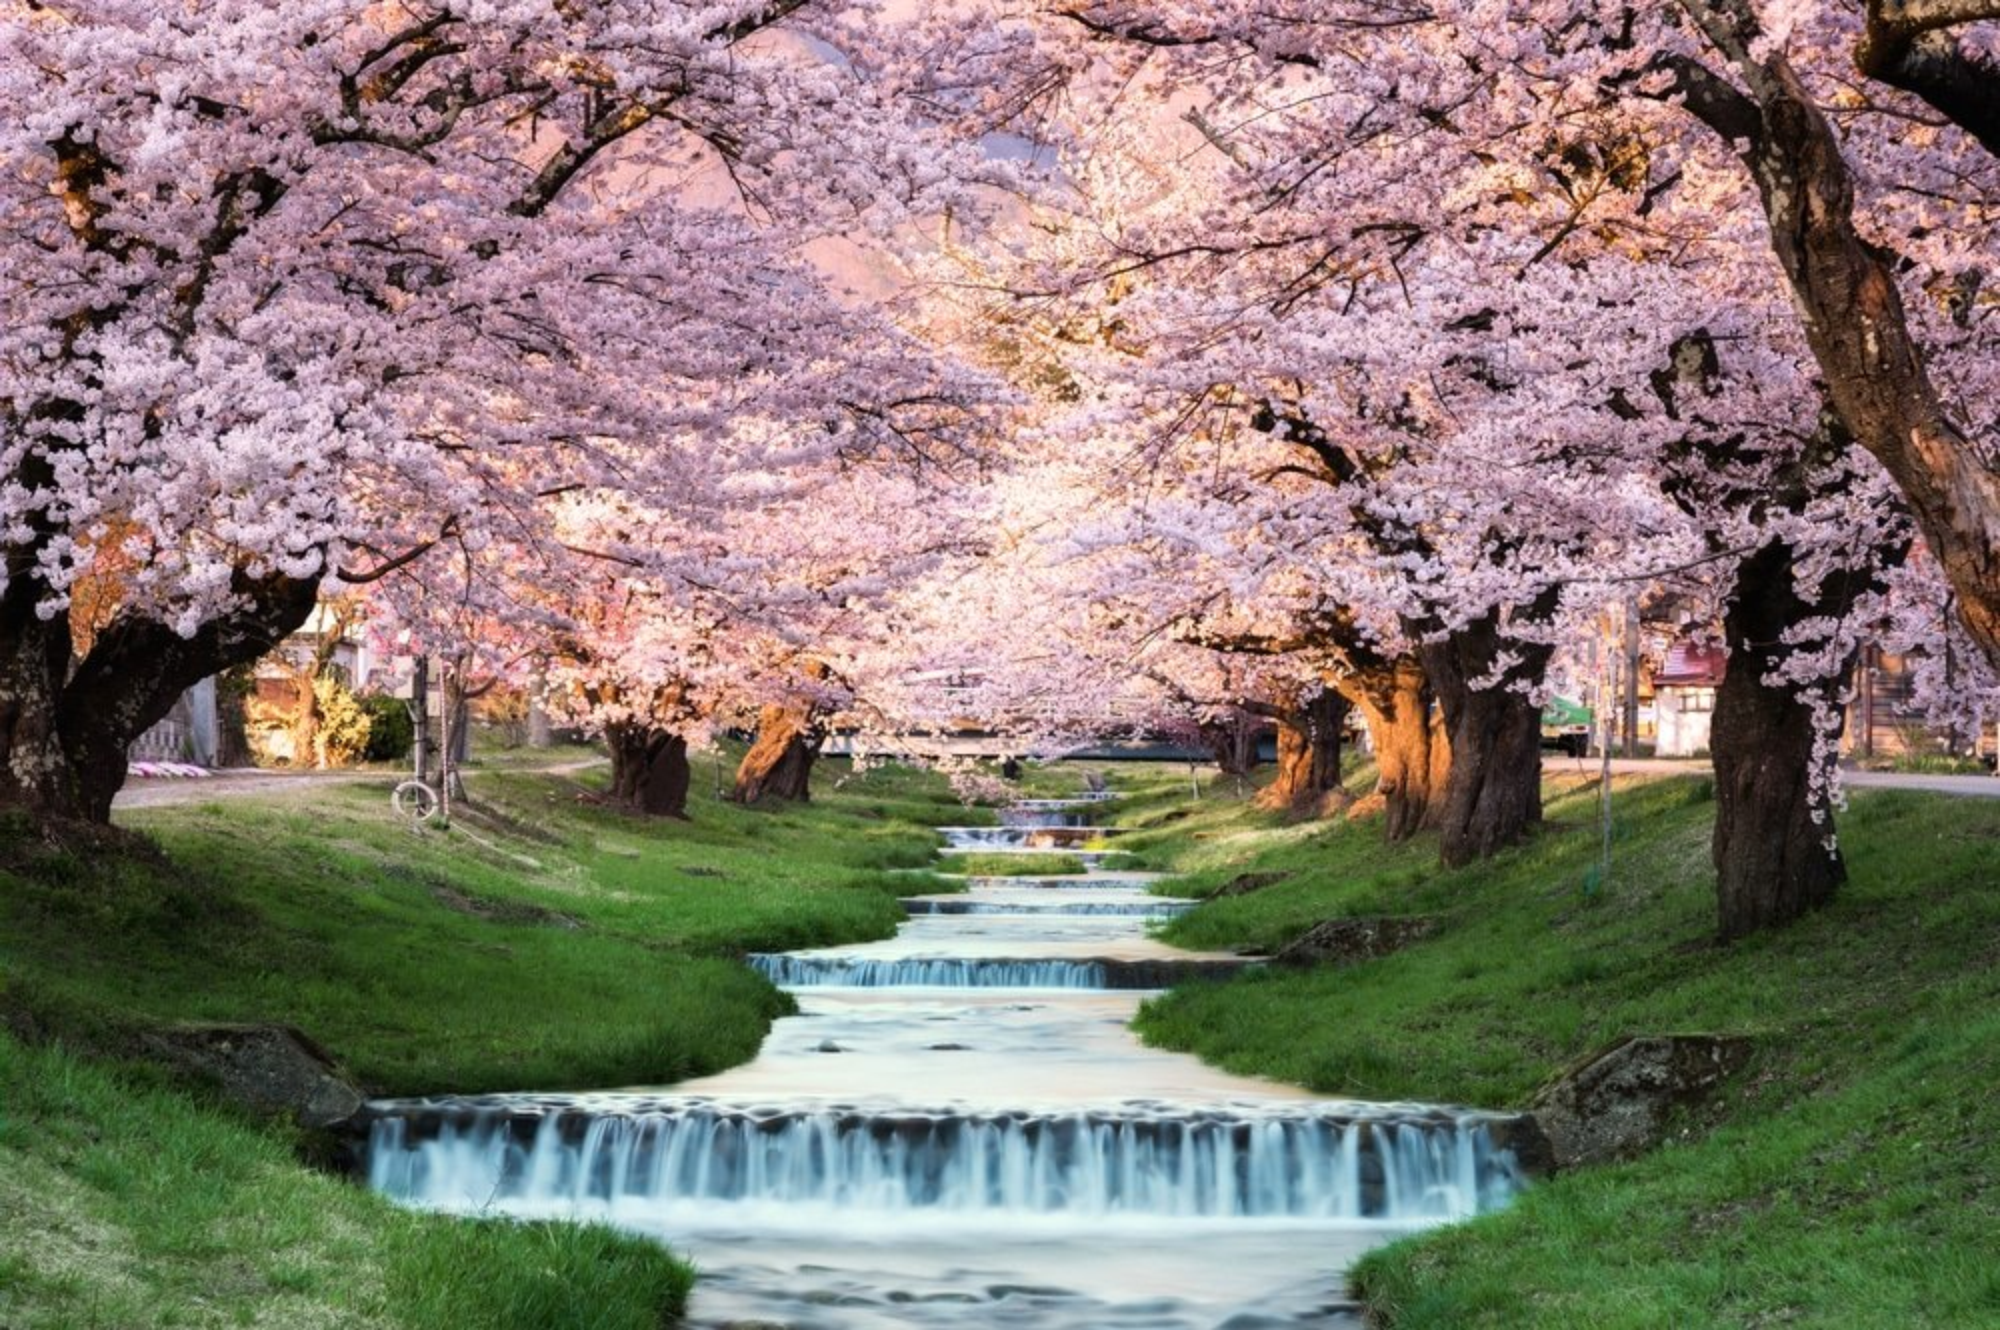 Fleurs de cerisiers à Kawageta Fukushima, Japon